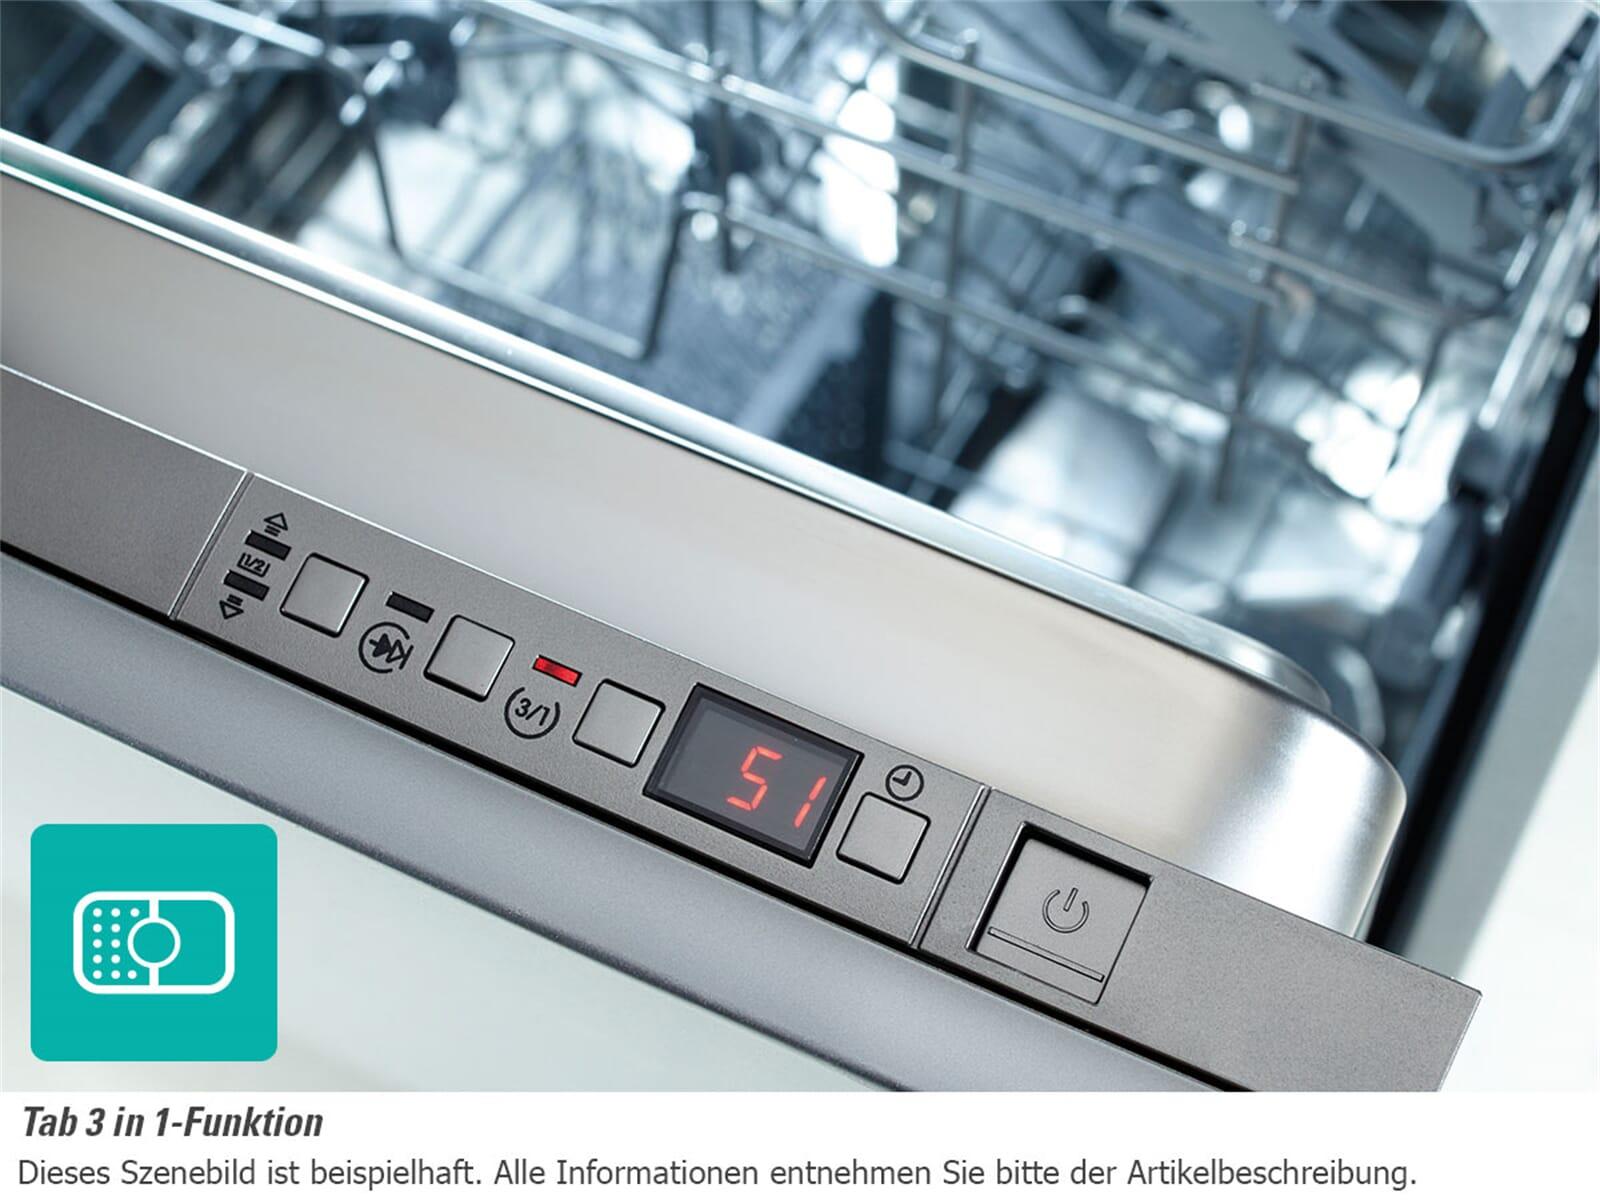 Gorenje Kühlschrank Seriennummer : Gorenje gi teilintegrierbarer einbaugeschirrspüler